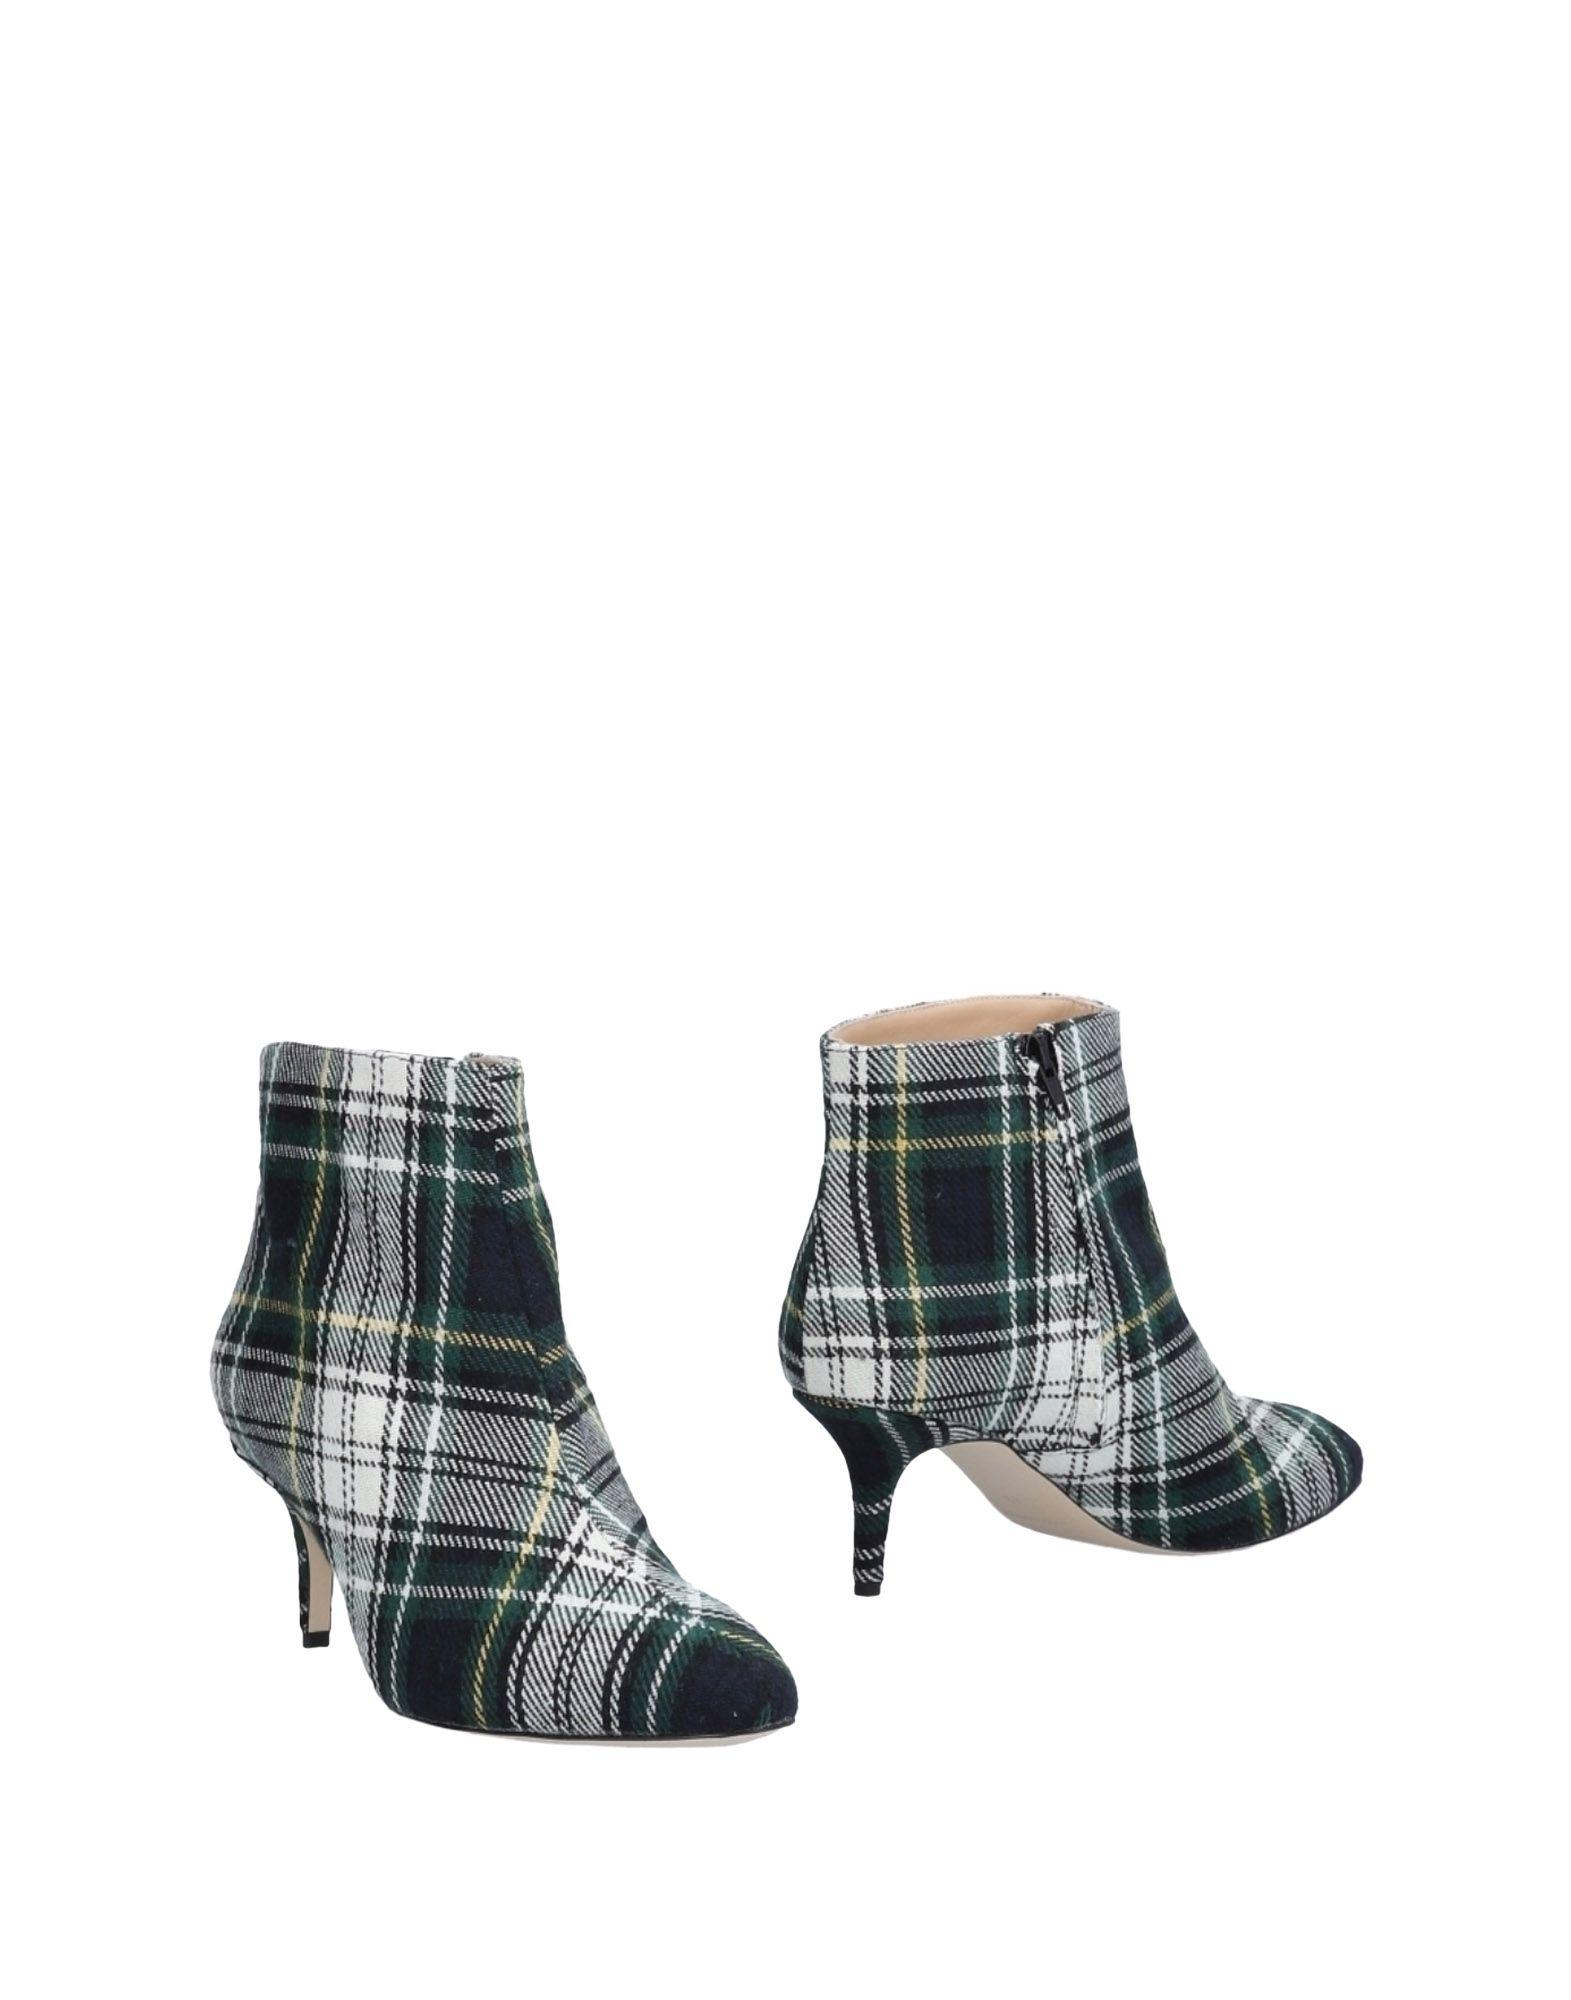 Marie Marí Stiefelette Damen  11484118FI Gute Qualität beliebte Schuhe